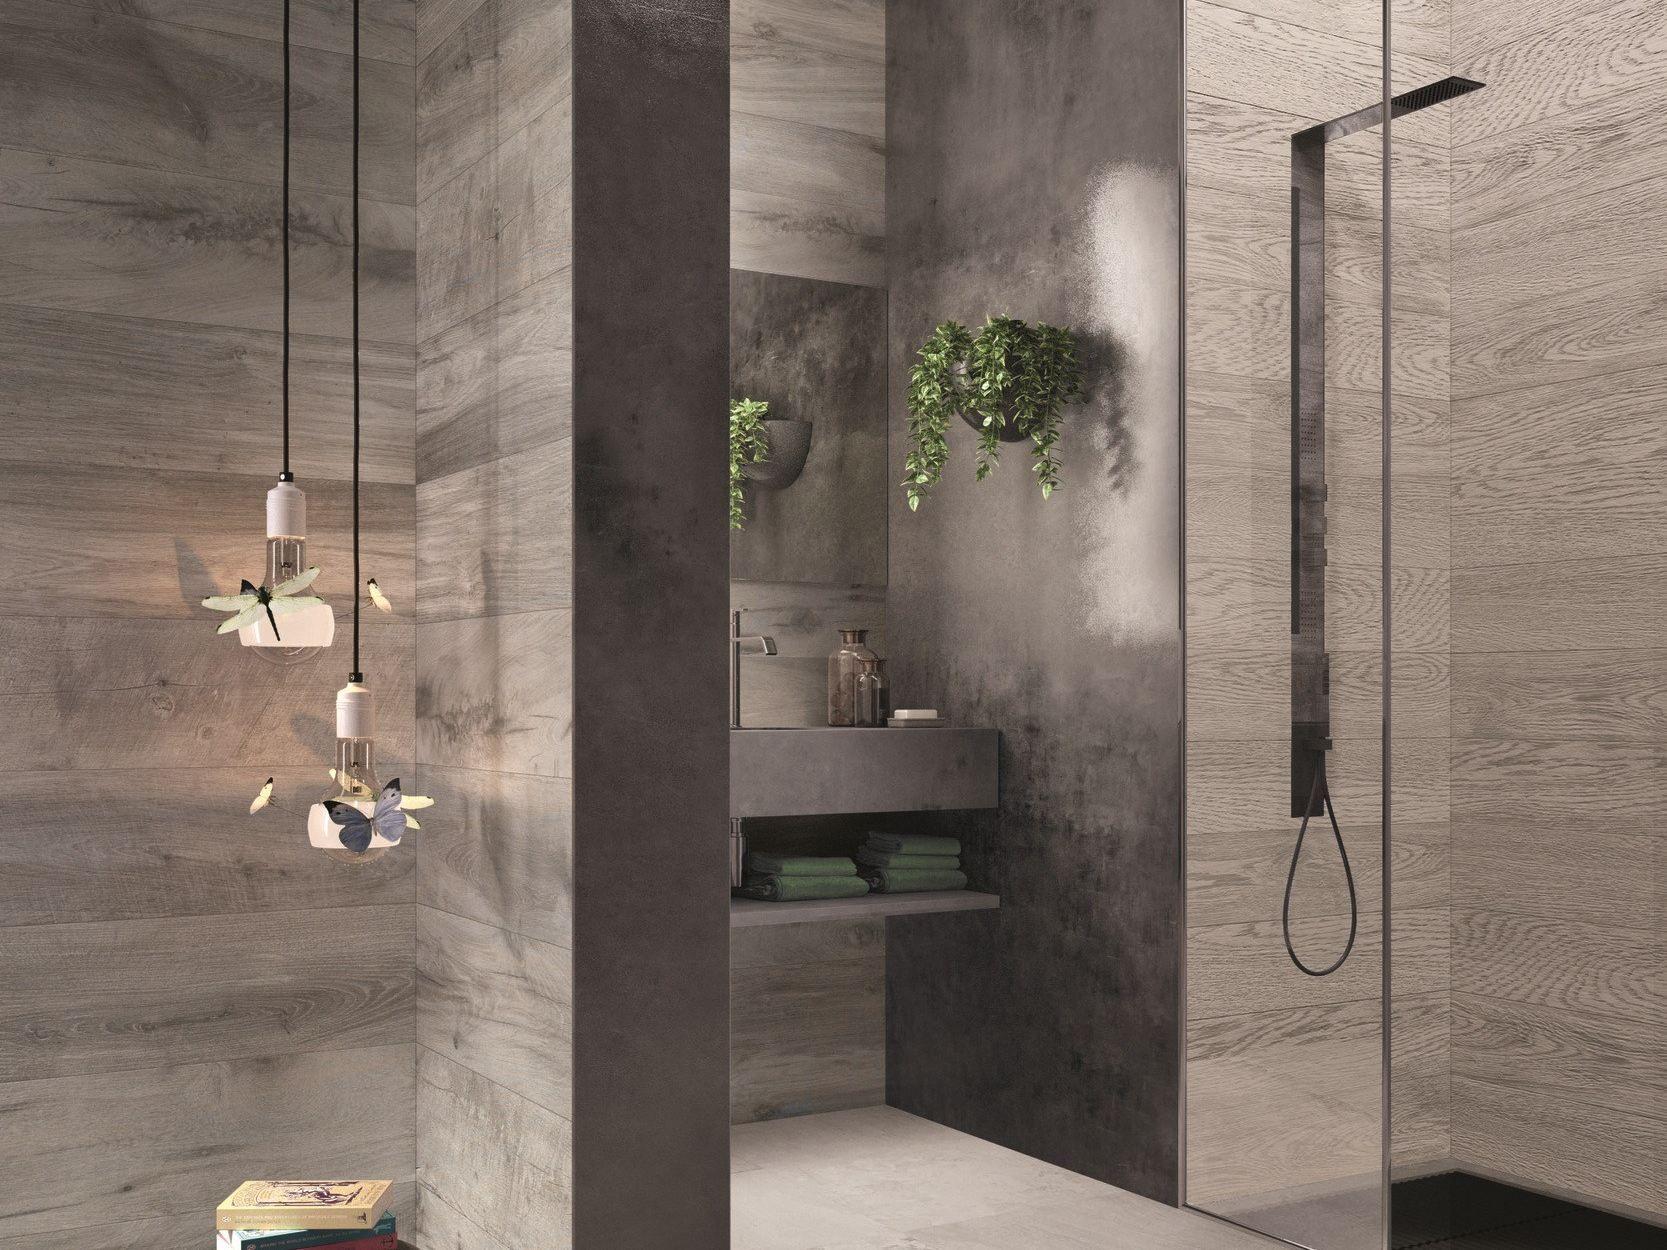 rev tement de sol mur en gr s c rame legend by ariana ceramica italiana. Black Bedroom Furniture Sets. Home Design Ideas